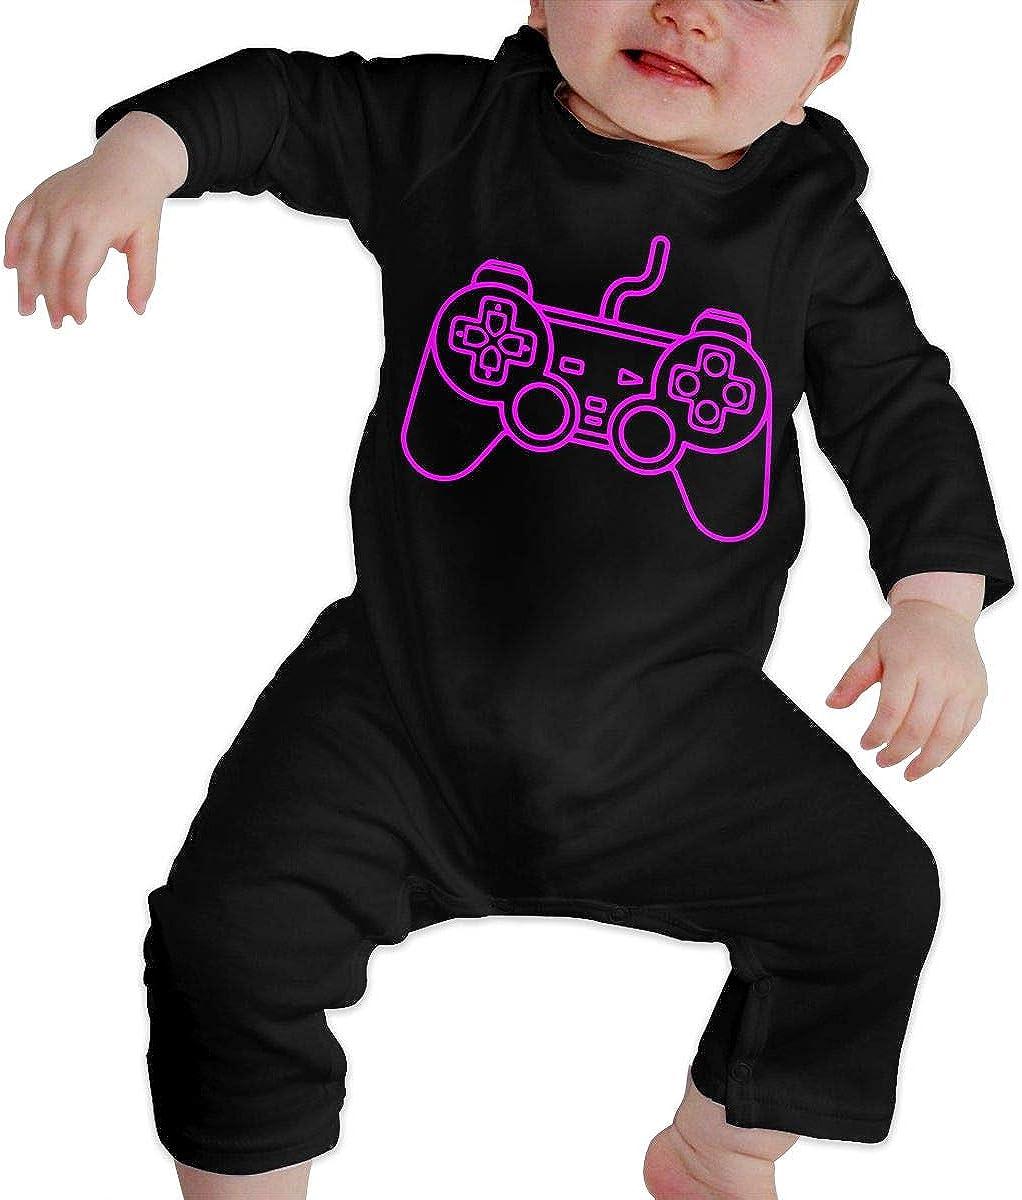 Playstation Controller Printed Boys Girls Jumpsuit Long Sleeve Rompers Black